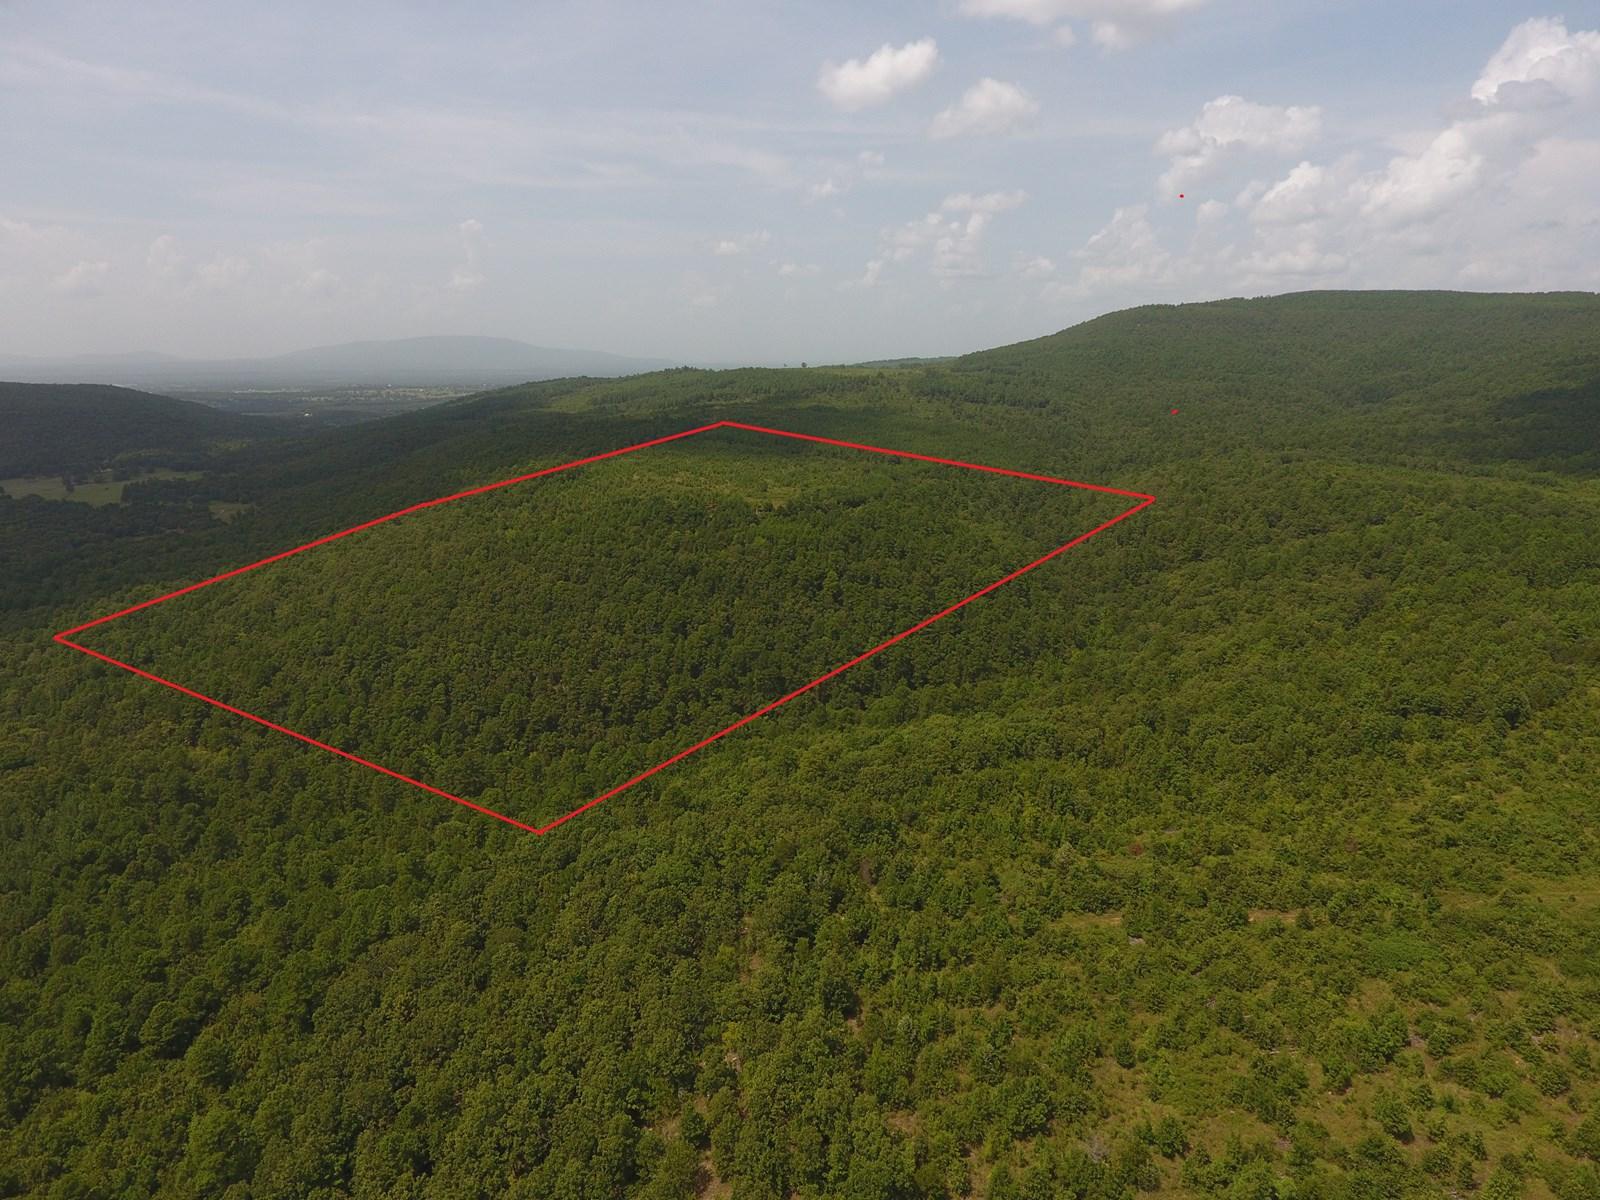 62 Acre Poteau Mountain Recreational Property